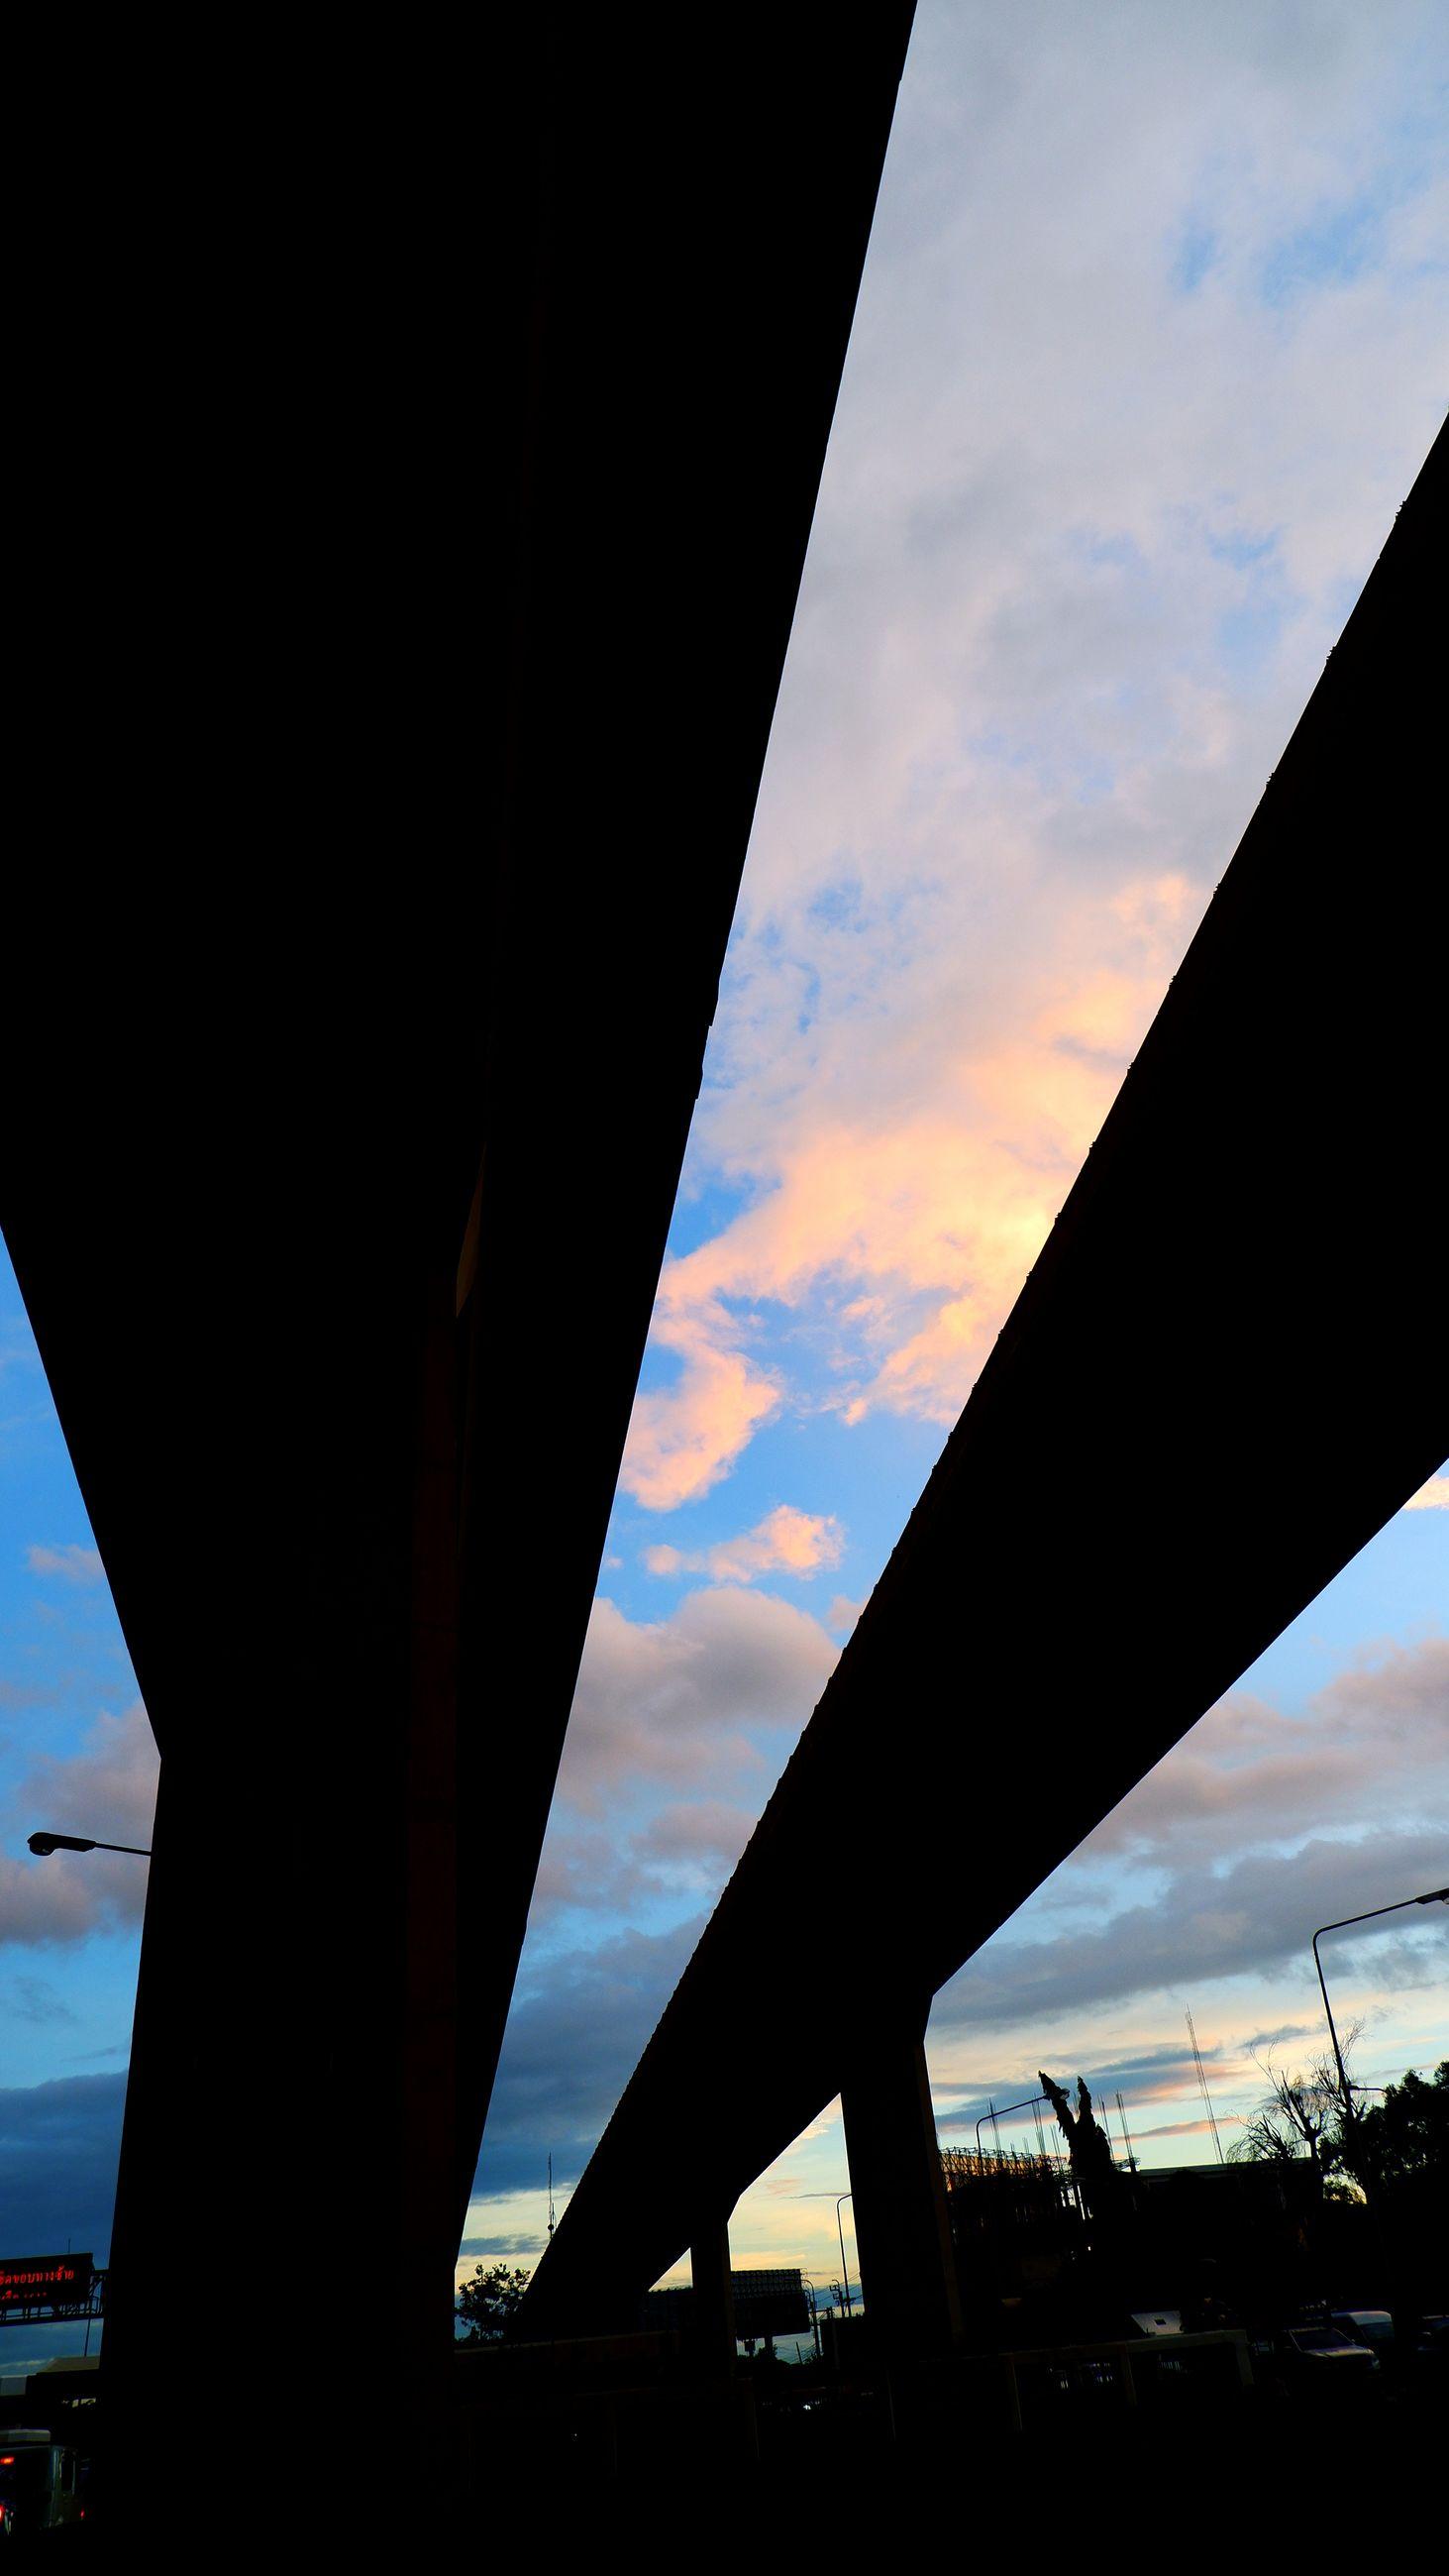 sky, architecture, transportation, silhouette, sunset, built structure, bridge, reflection, evening, dusk, cloud, horizon, nature, sunlight, no people, light, city, outdoors, mode of transportation, road